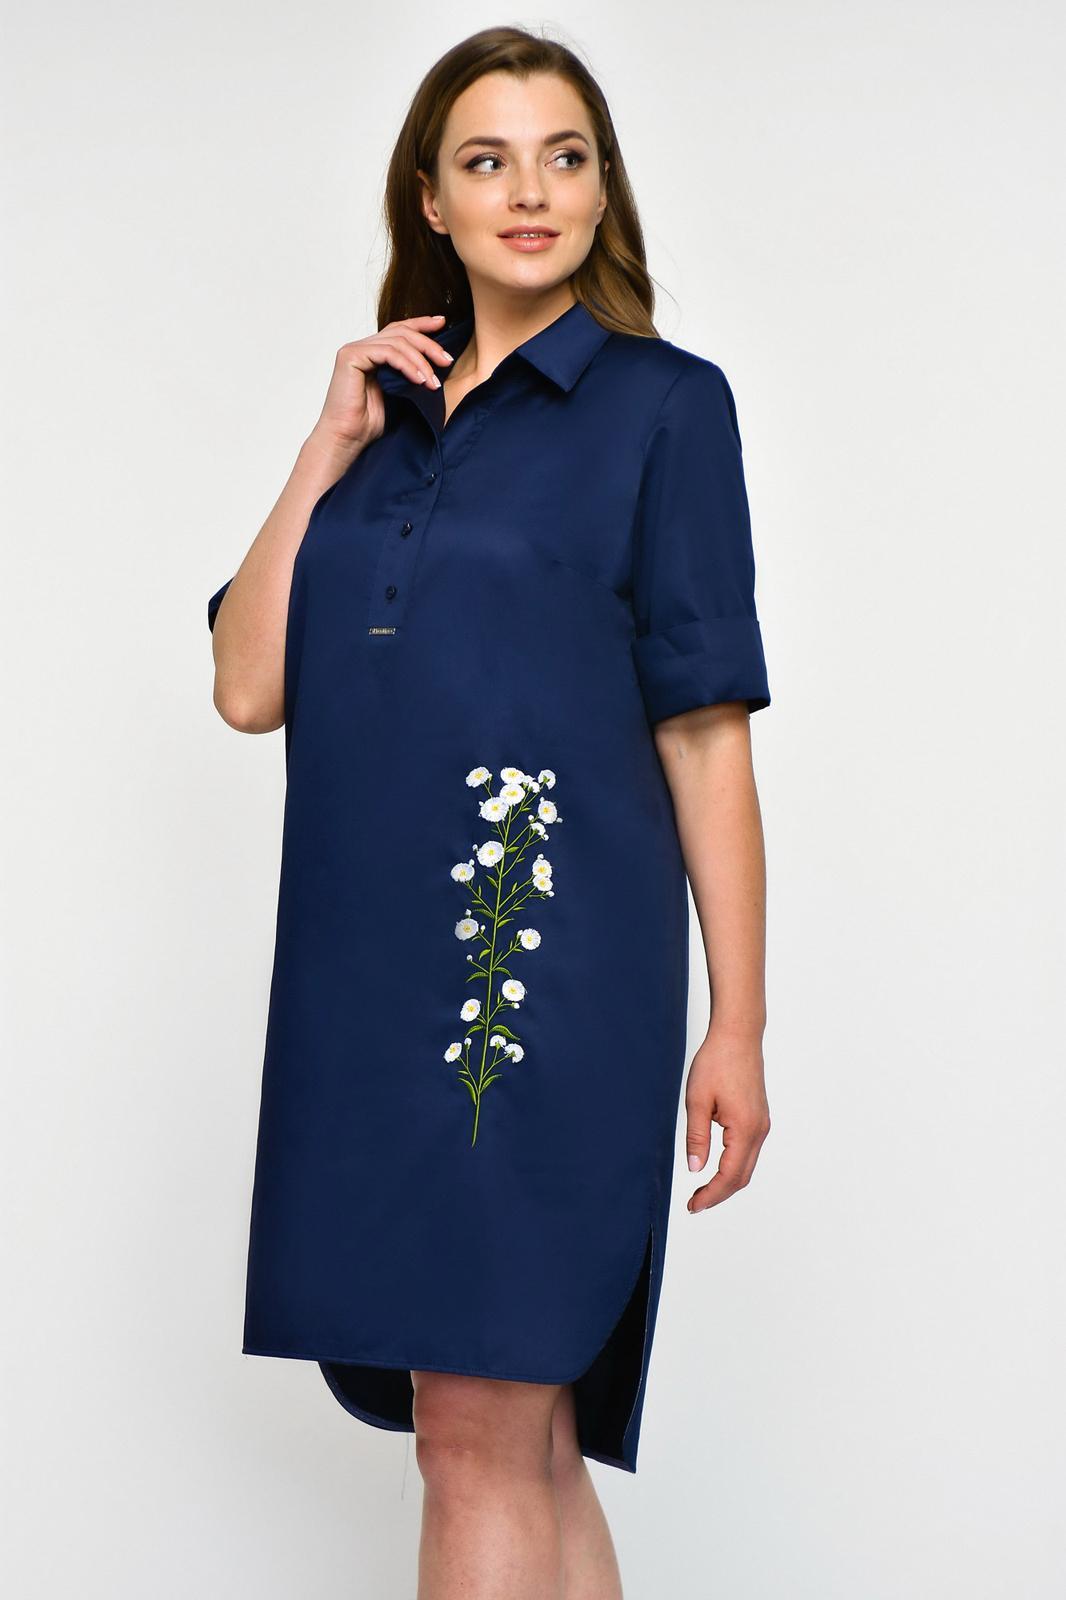 Купить Платье Prestige, 3363 синий, Беларусь